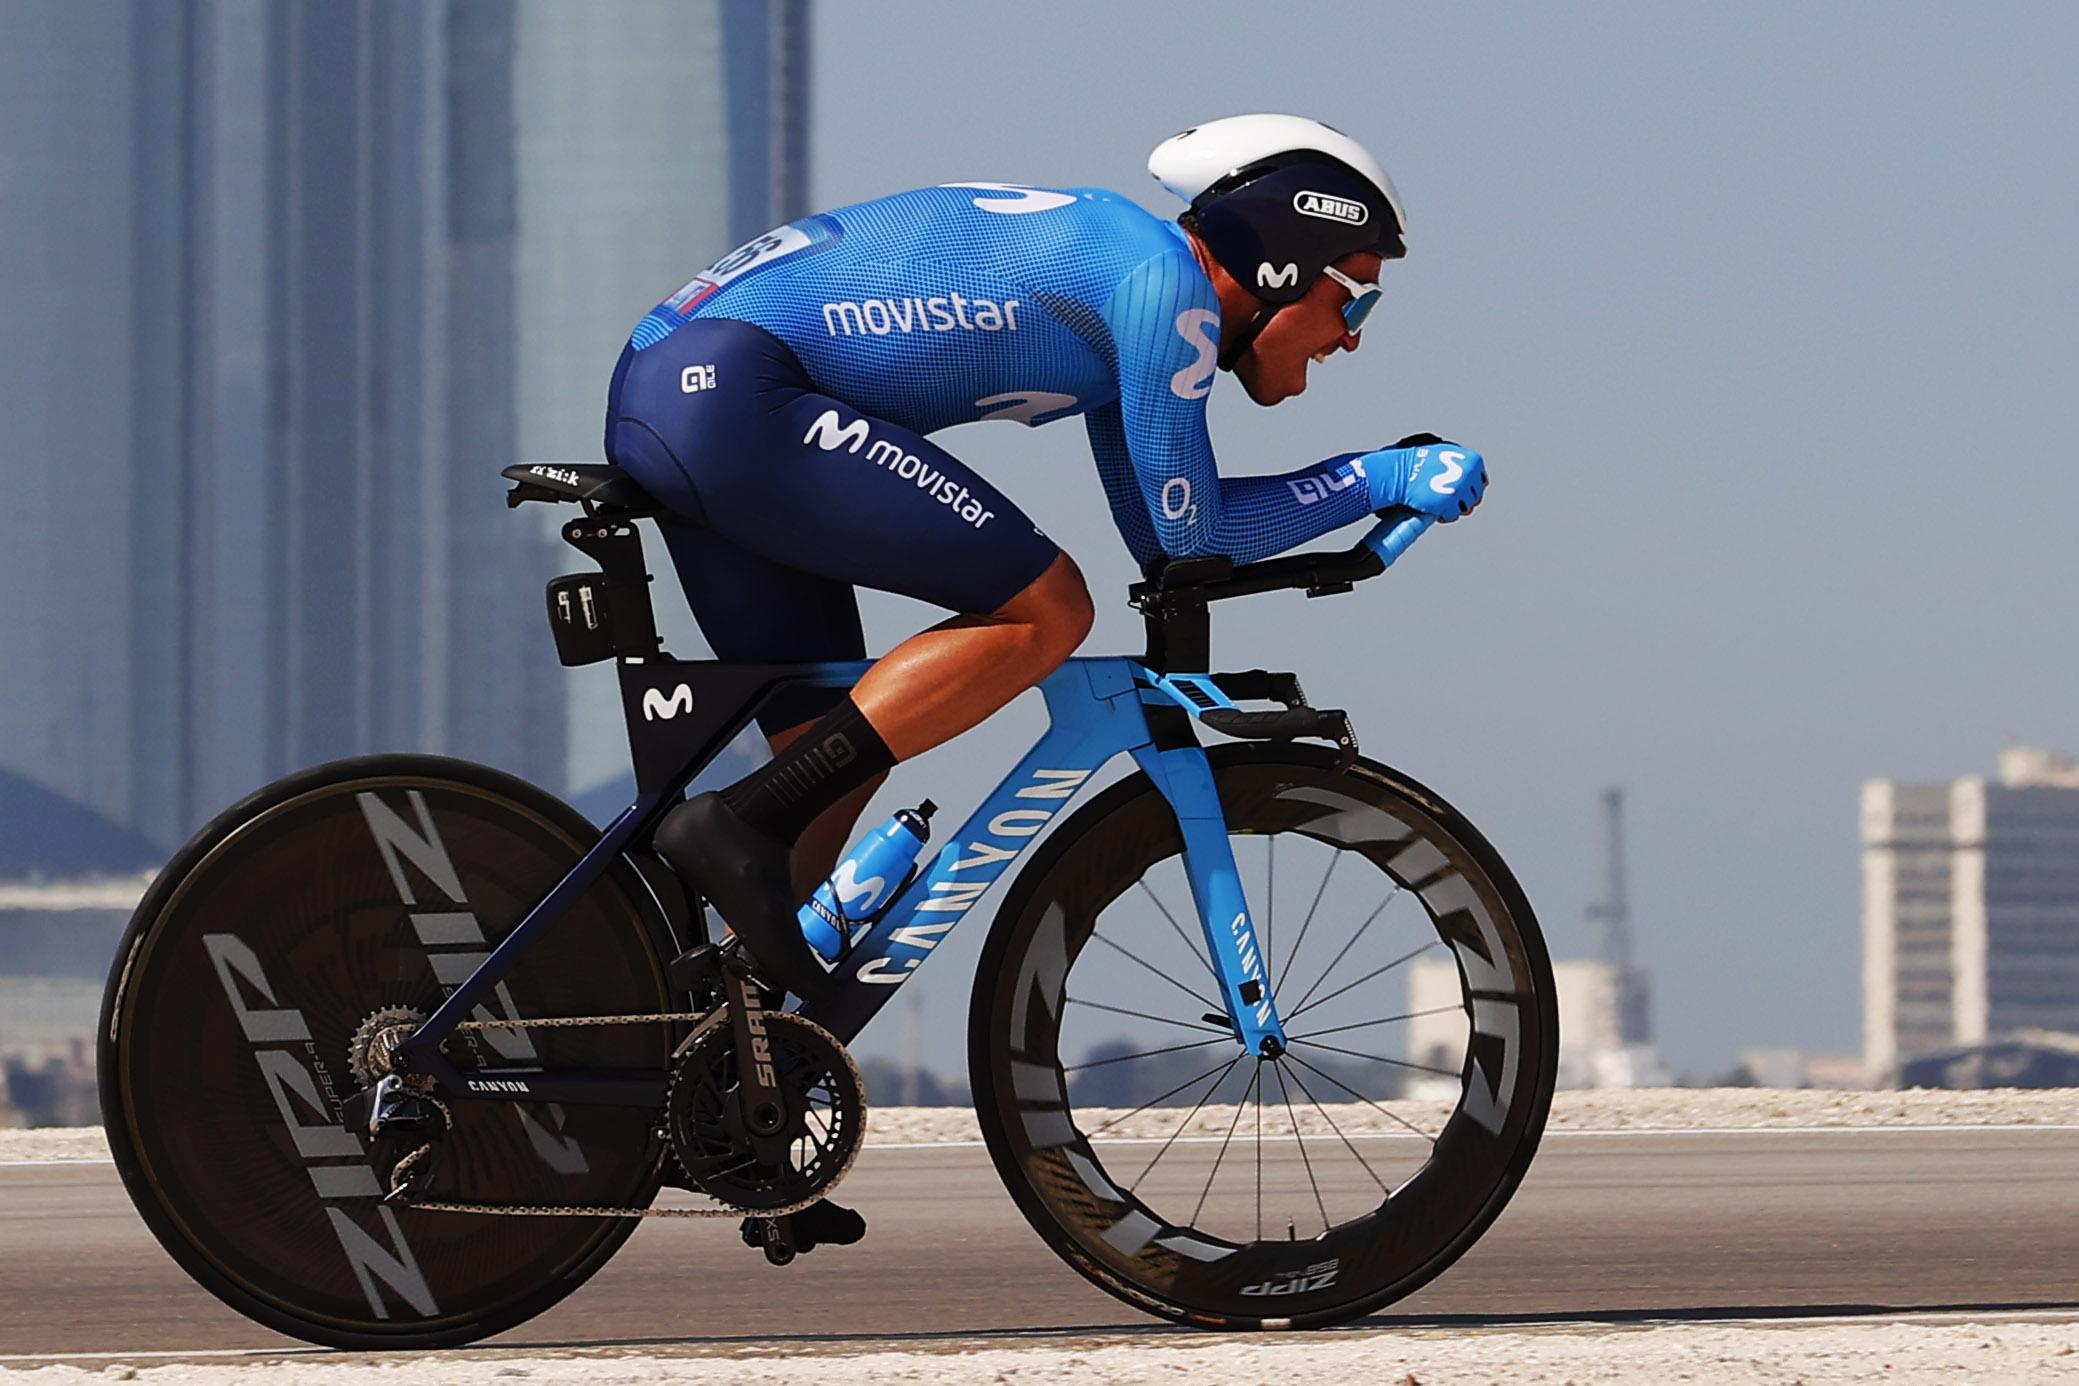 Track specialist Torres top Movistar Team performer at fast-paced ITT |  Movistar Team